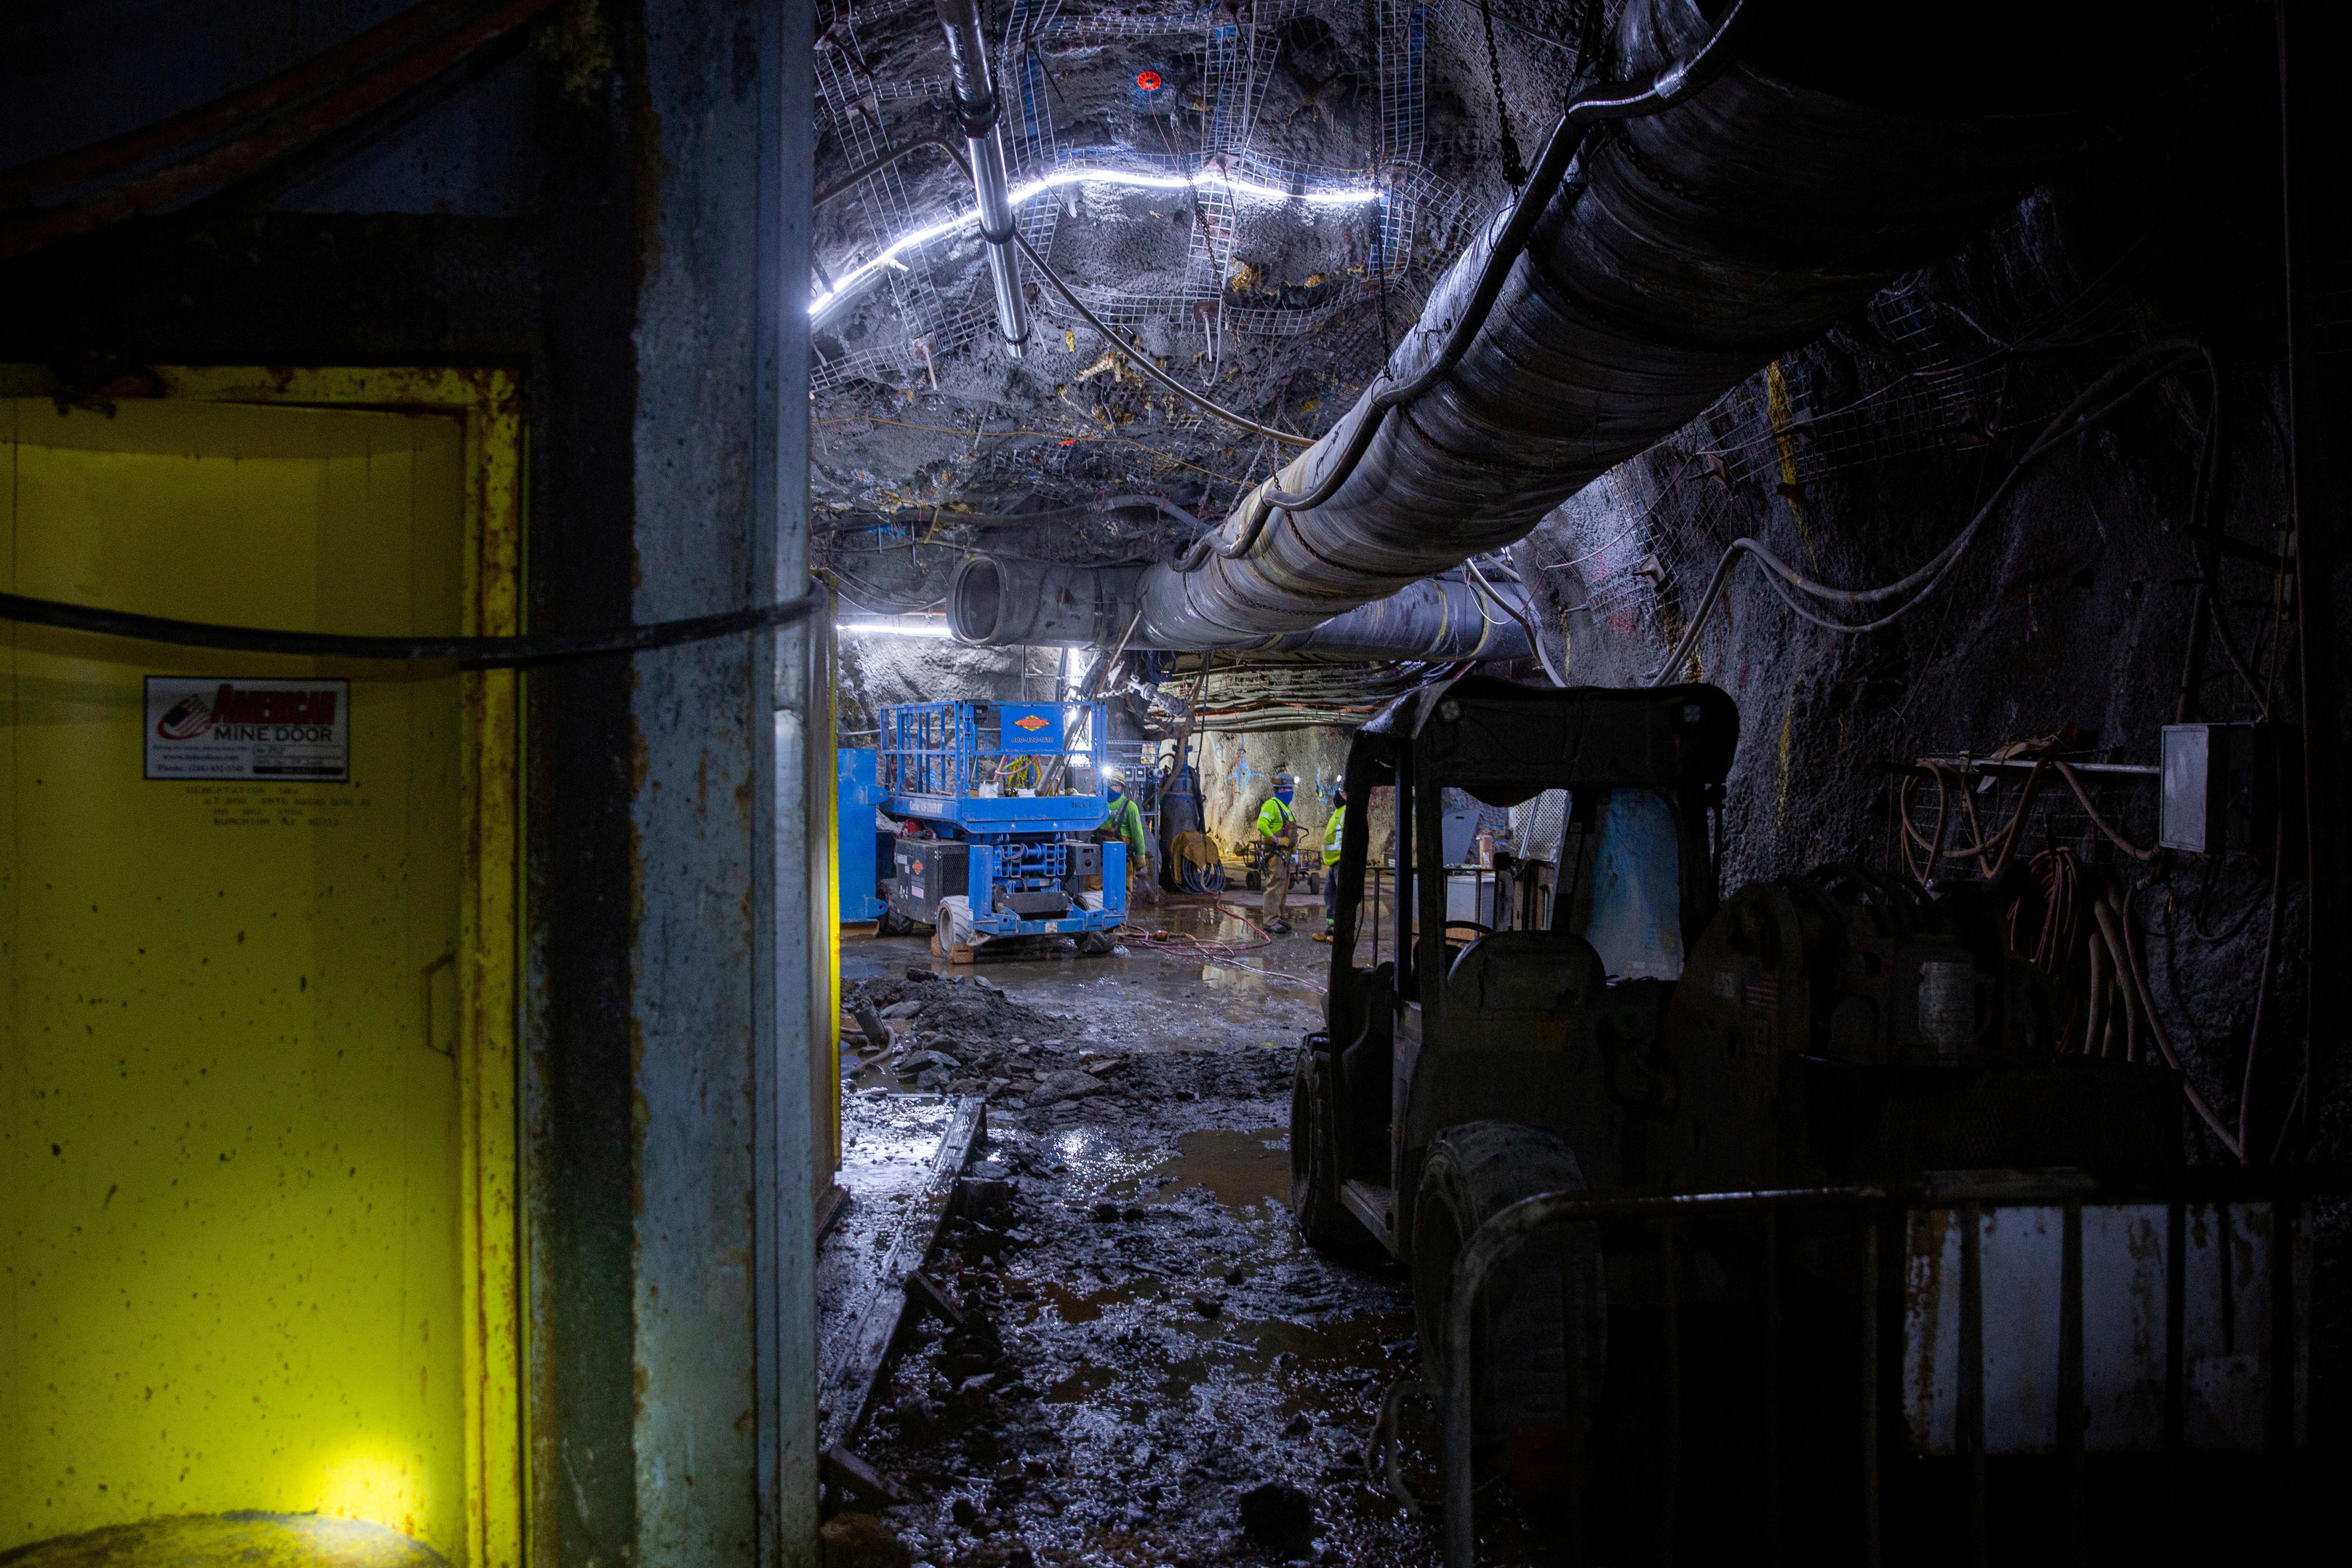 Mine workers Matthew Berumen, Chris Allison and Ray Ramirez do maintenance work 6780 ft (2066 m) underground in the Resolution Copper exploratory mine shaft 10 in Superior, Arizona, U.S., March 30, 2021.  REUTERS/Caitlin O'Hara/File Photo